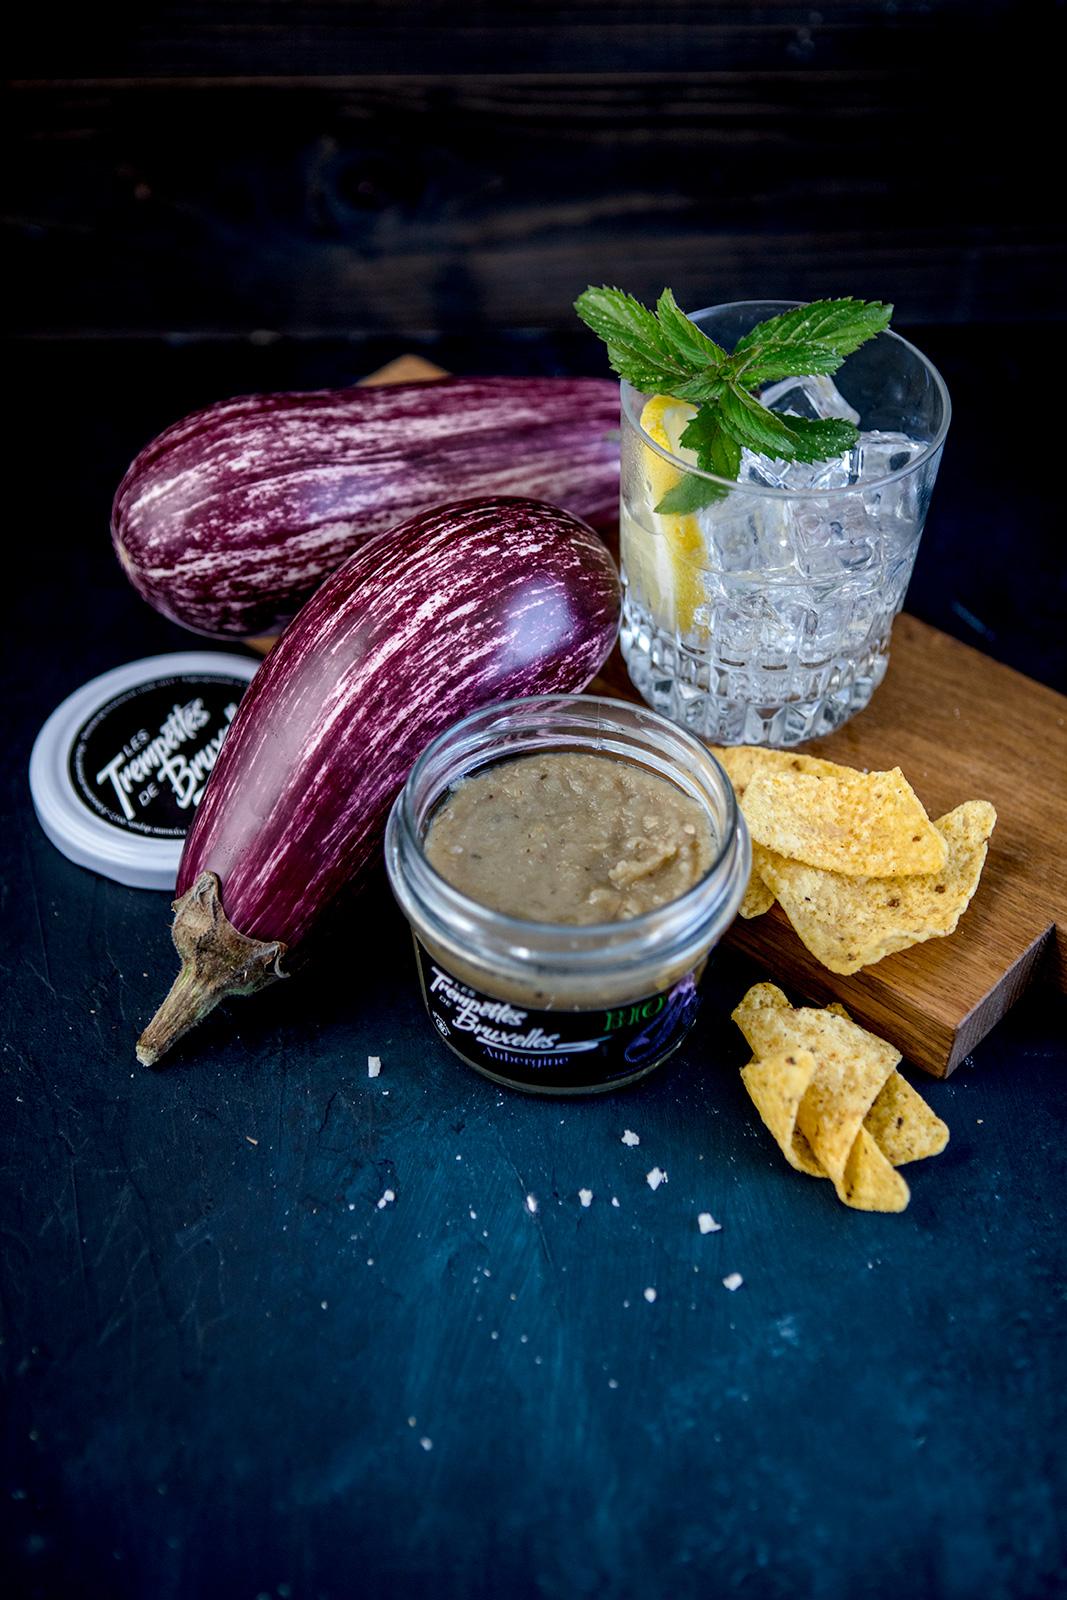 Les Trempettes de Bruxelles – eggplant recipe